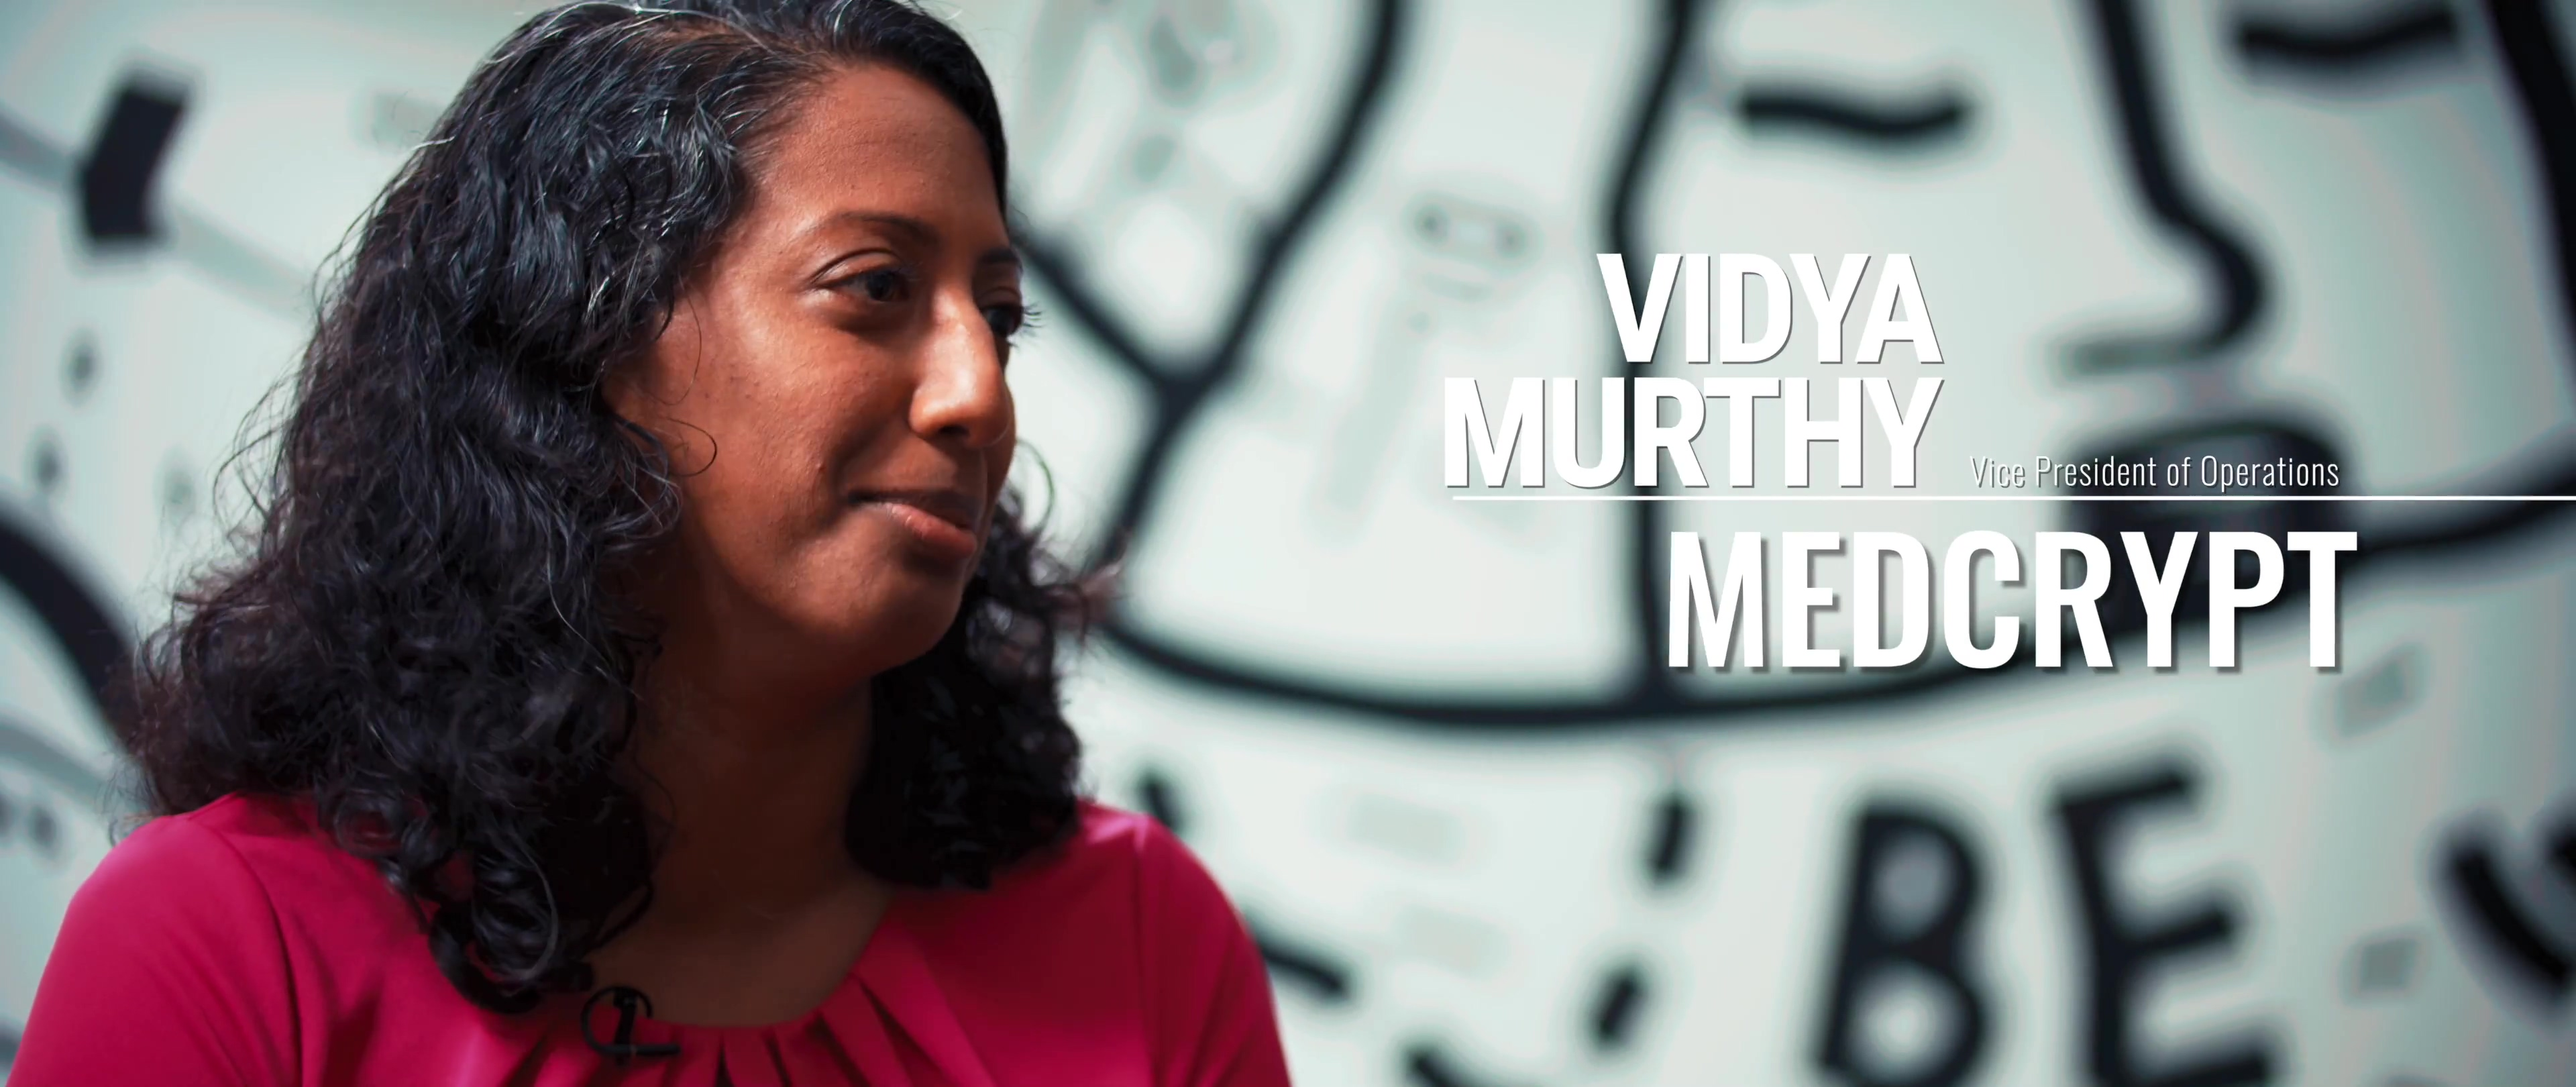 BAM_Vidya Murthy_Medcrypt_2021